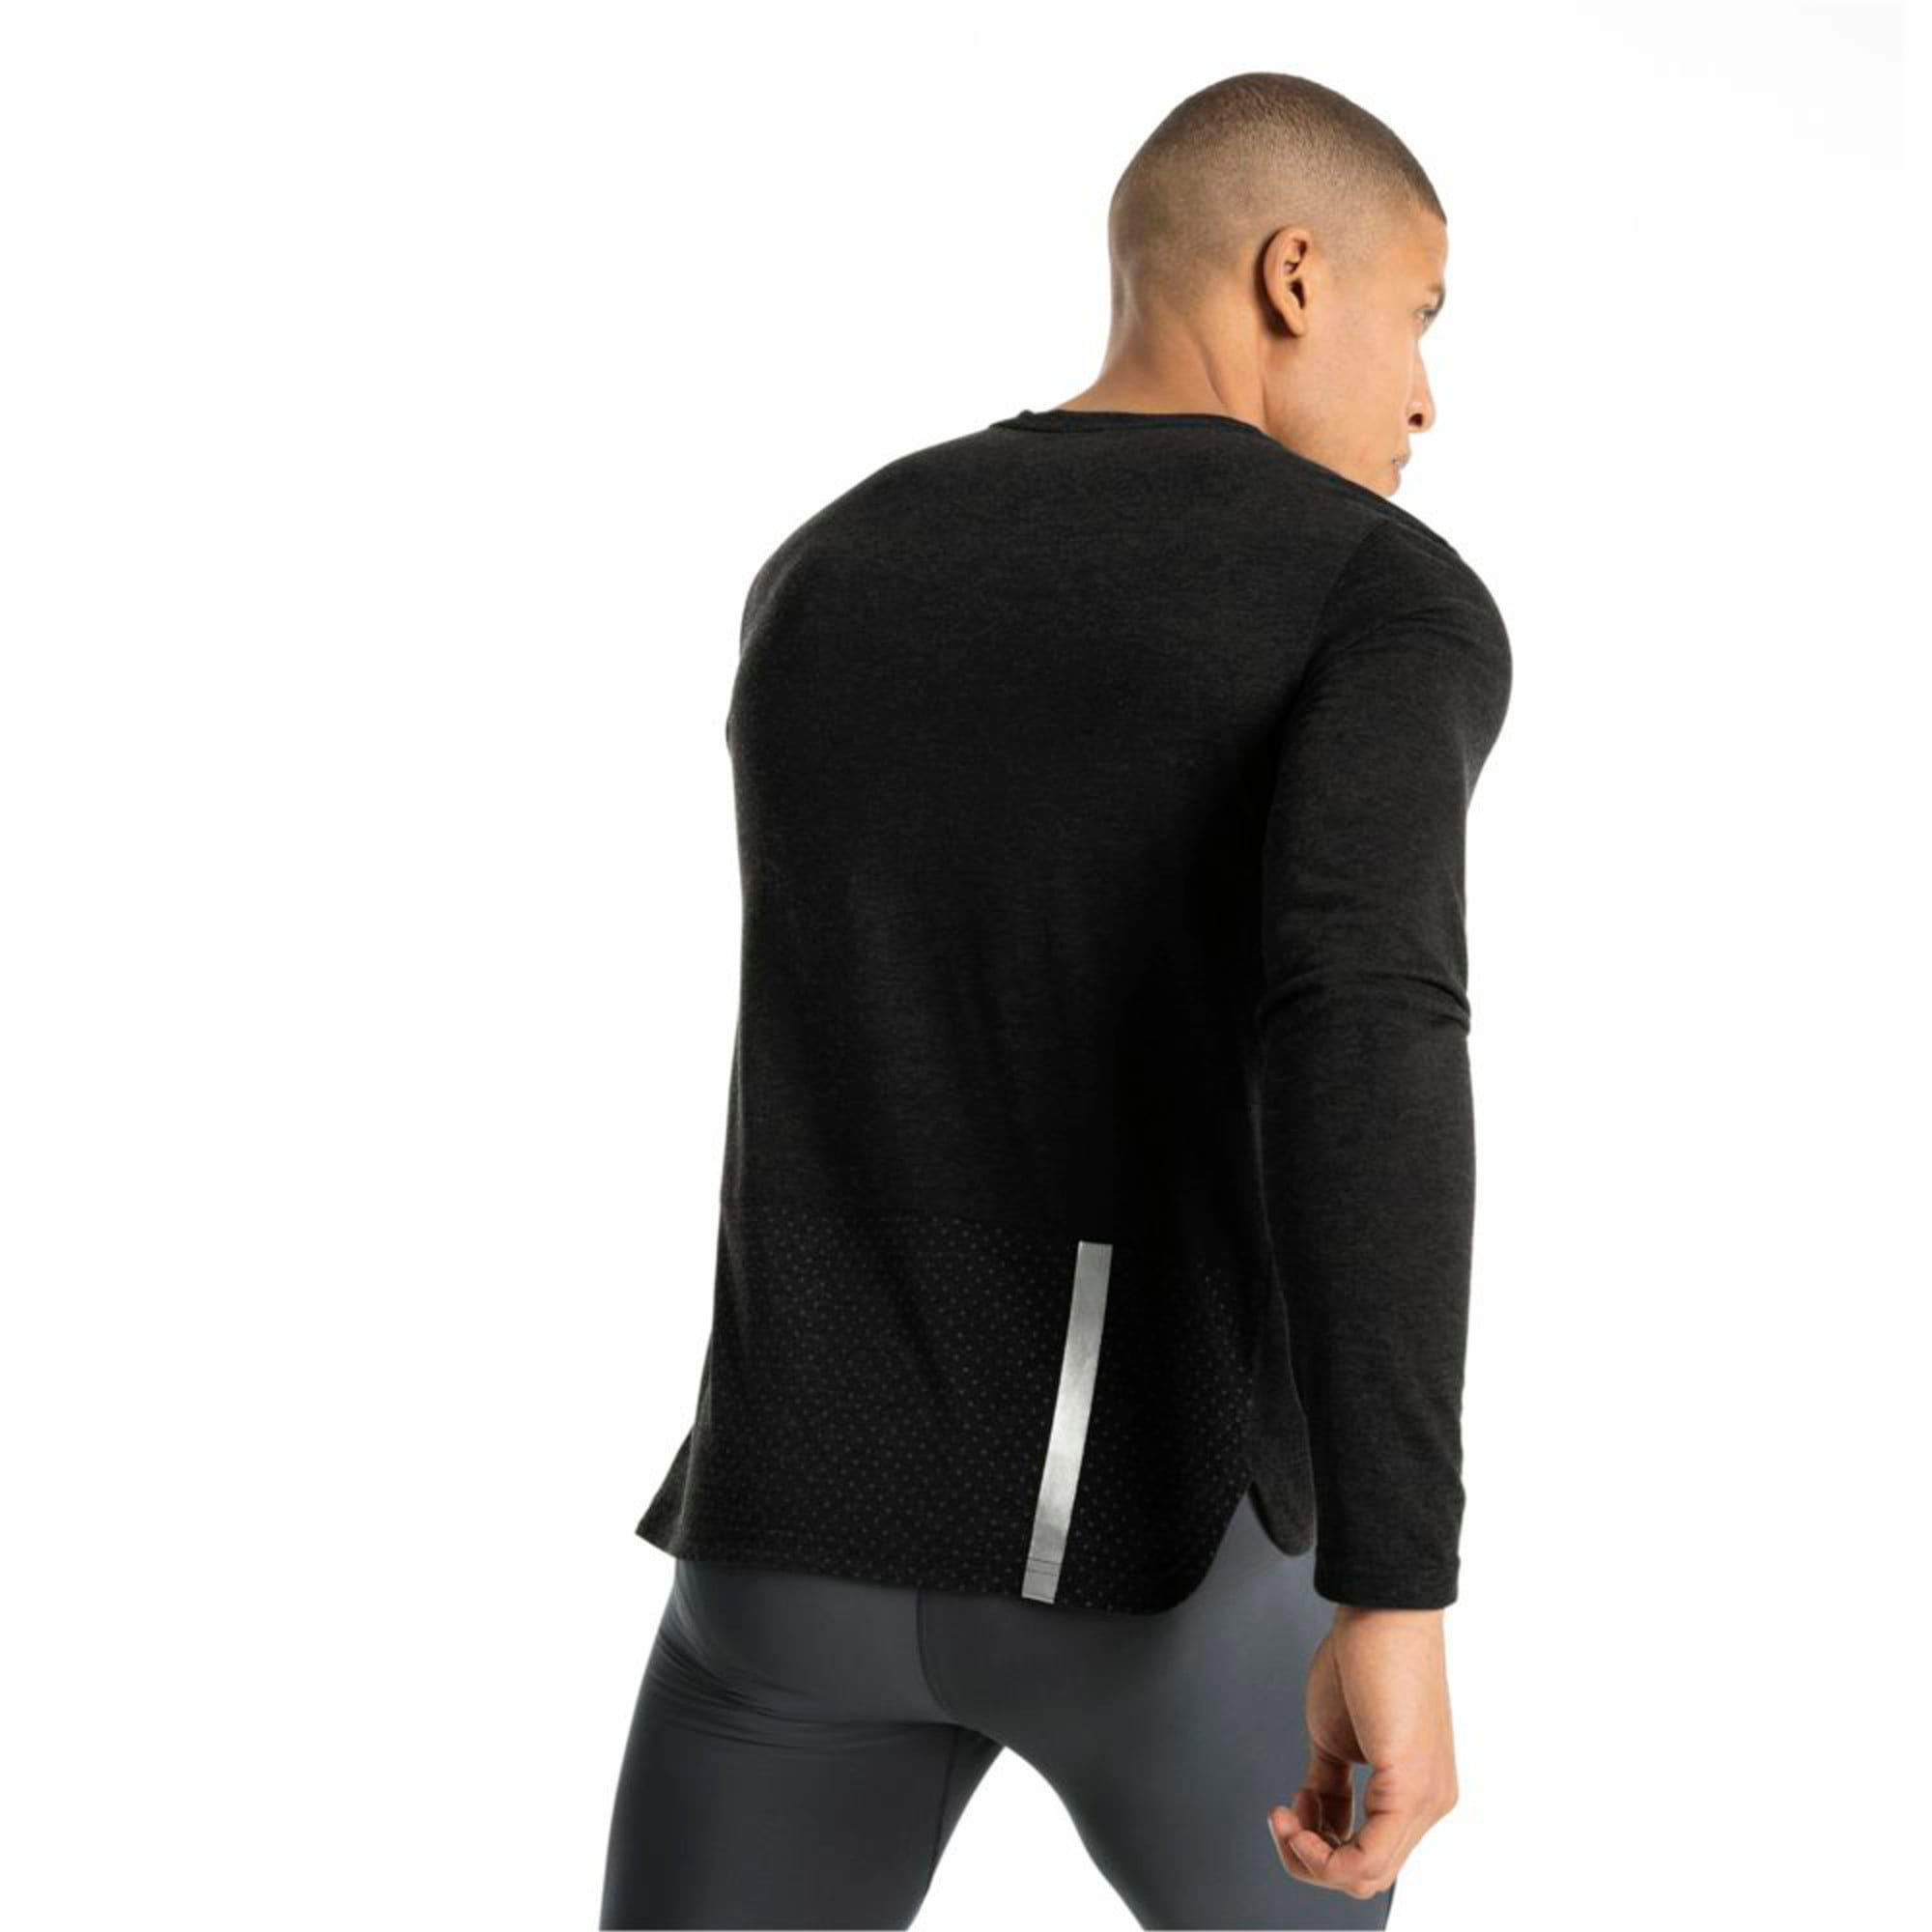 Thumbnail 5 of Warming Long Sleeve Men's Training Top, Puma Black Heather, medium-IND